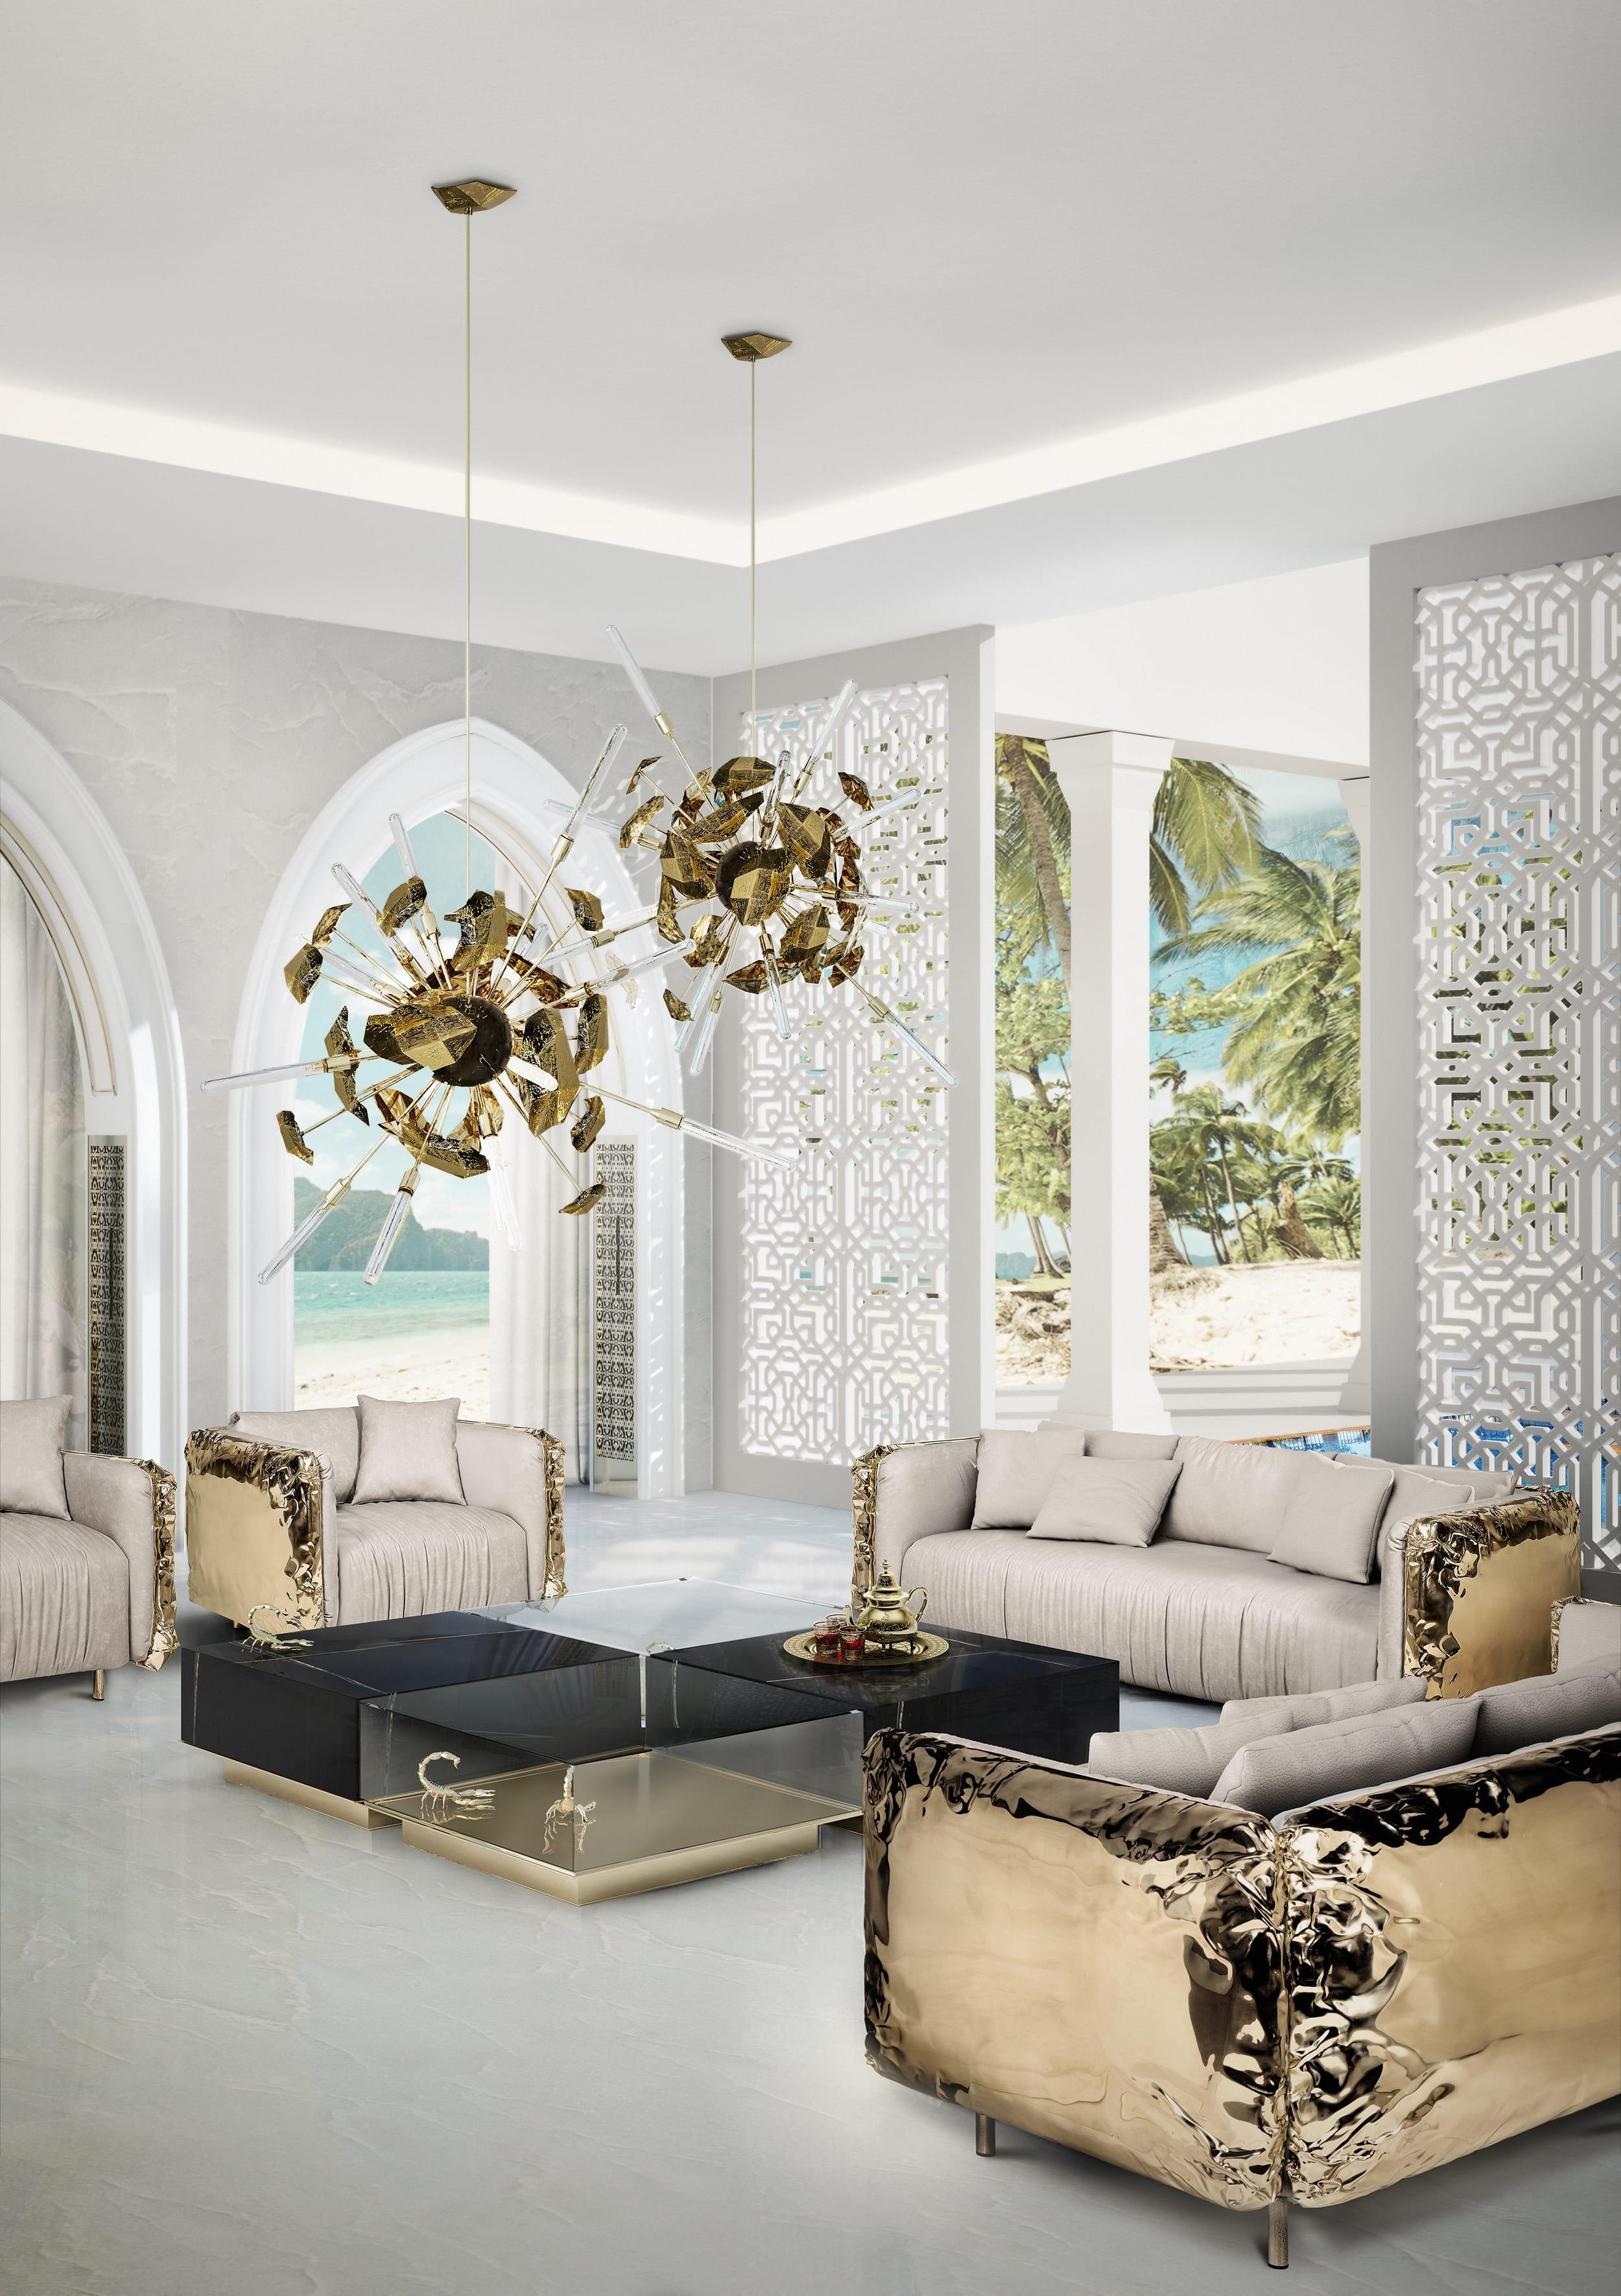 boca do lobo Celebrating 15 Years Of Boca do Lobo Through 15 Iconic Pieces ambience arabe